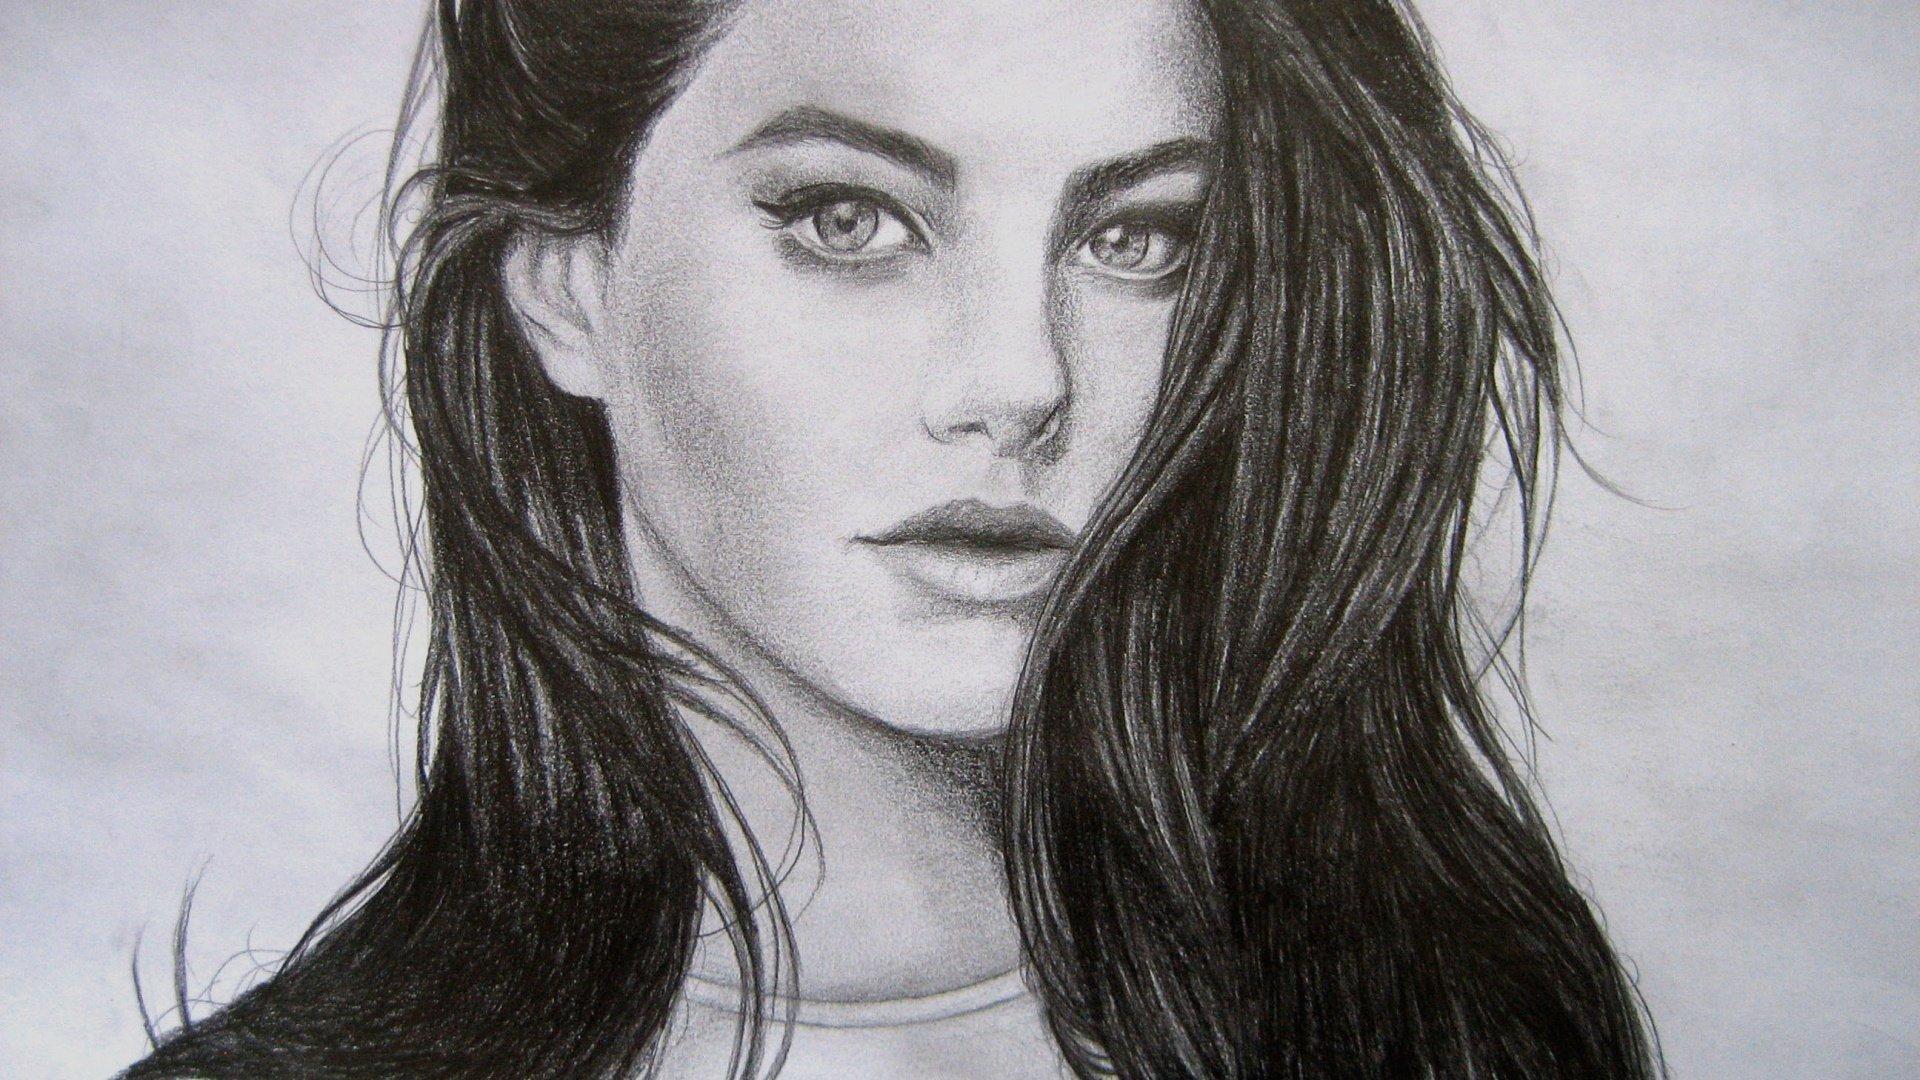 Лицо девушки фото для срисовки